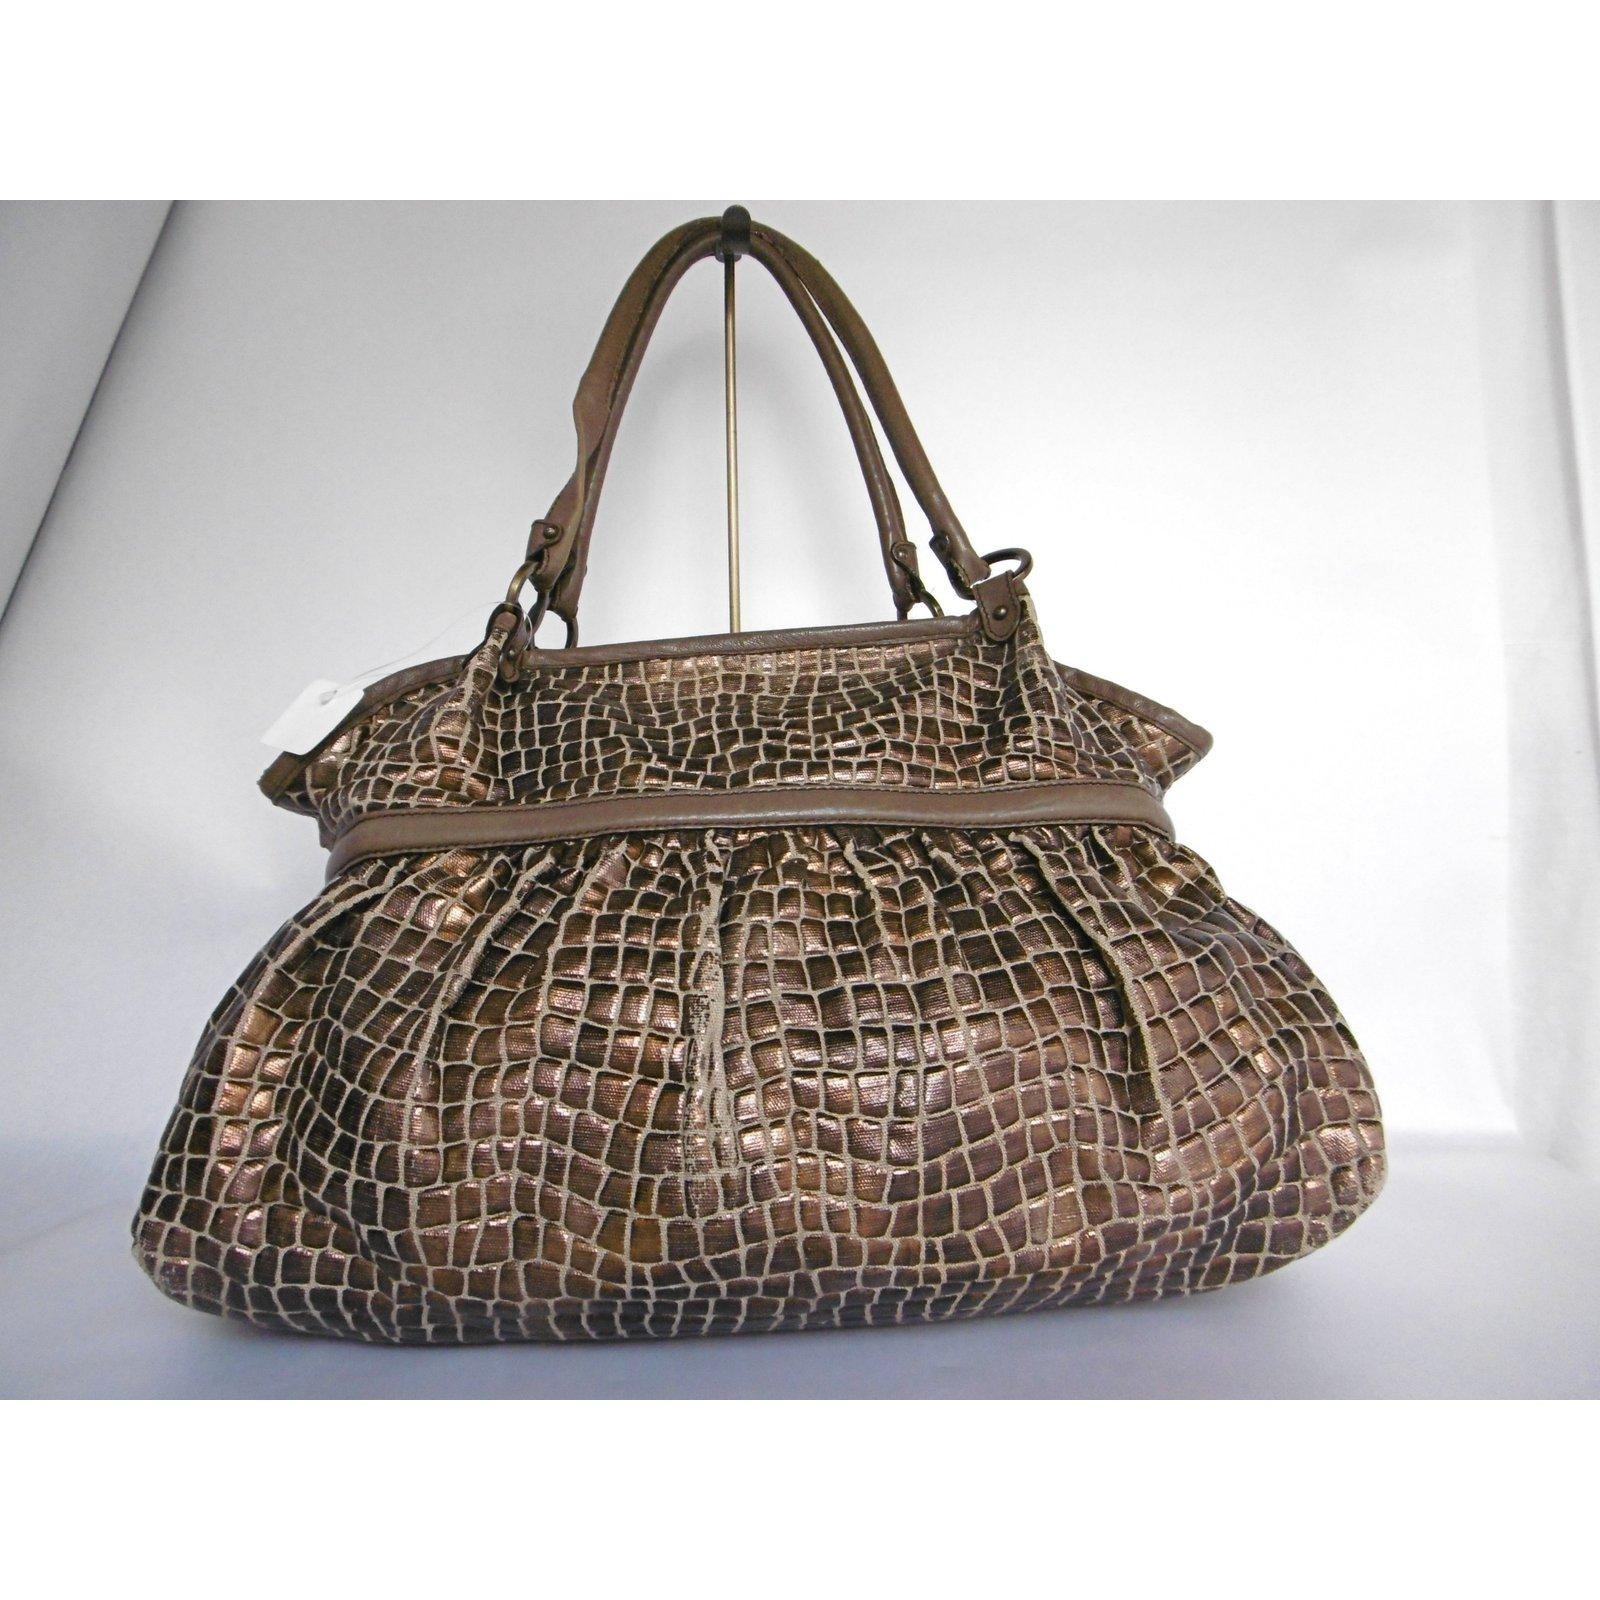 6f5ec74d28 Fendi Canvas Leather Metallic Bronze Tote Bag Handbags Leather